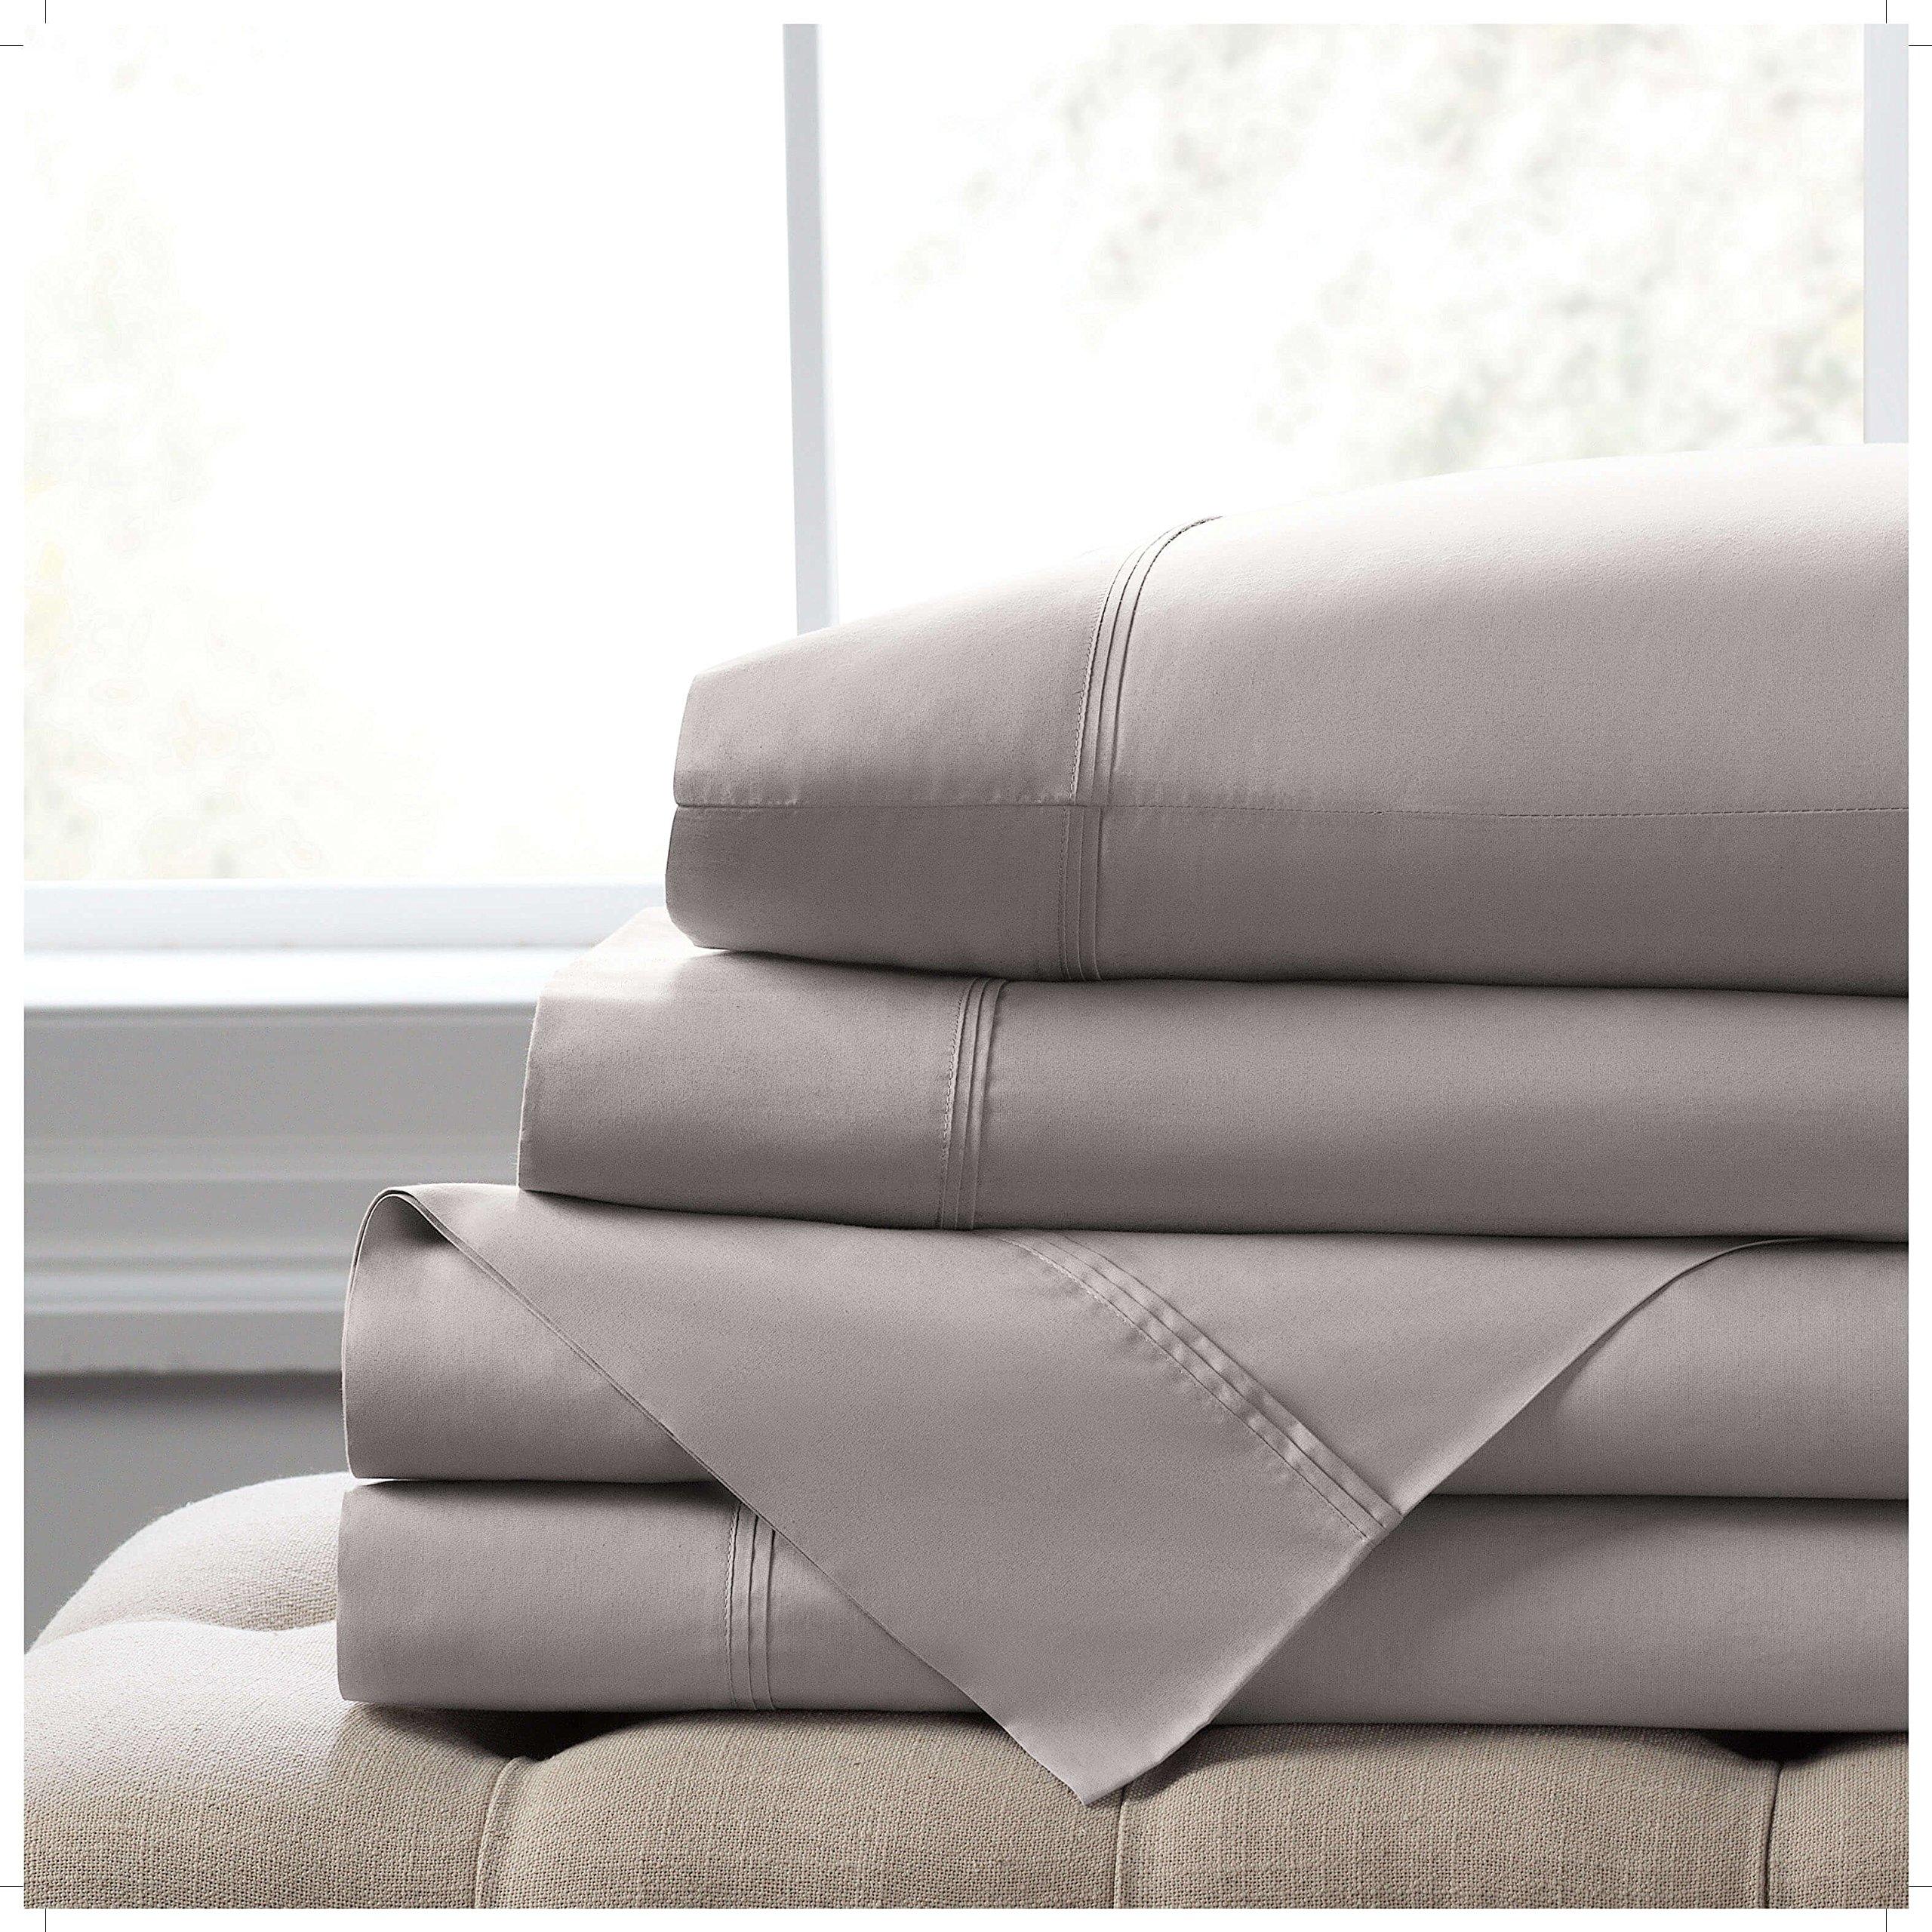 Elizabeth Arden Light-Weight 100% Long-Staple Cotton Percale Set of 2 Pillowcases - Ultra-Fine Natural Pure 300 Thread Count – Crisp & Cool - Standard/Queen Pillowcase Set of 2 - Grey